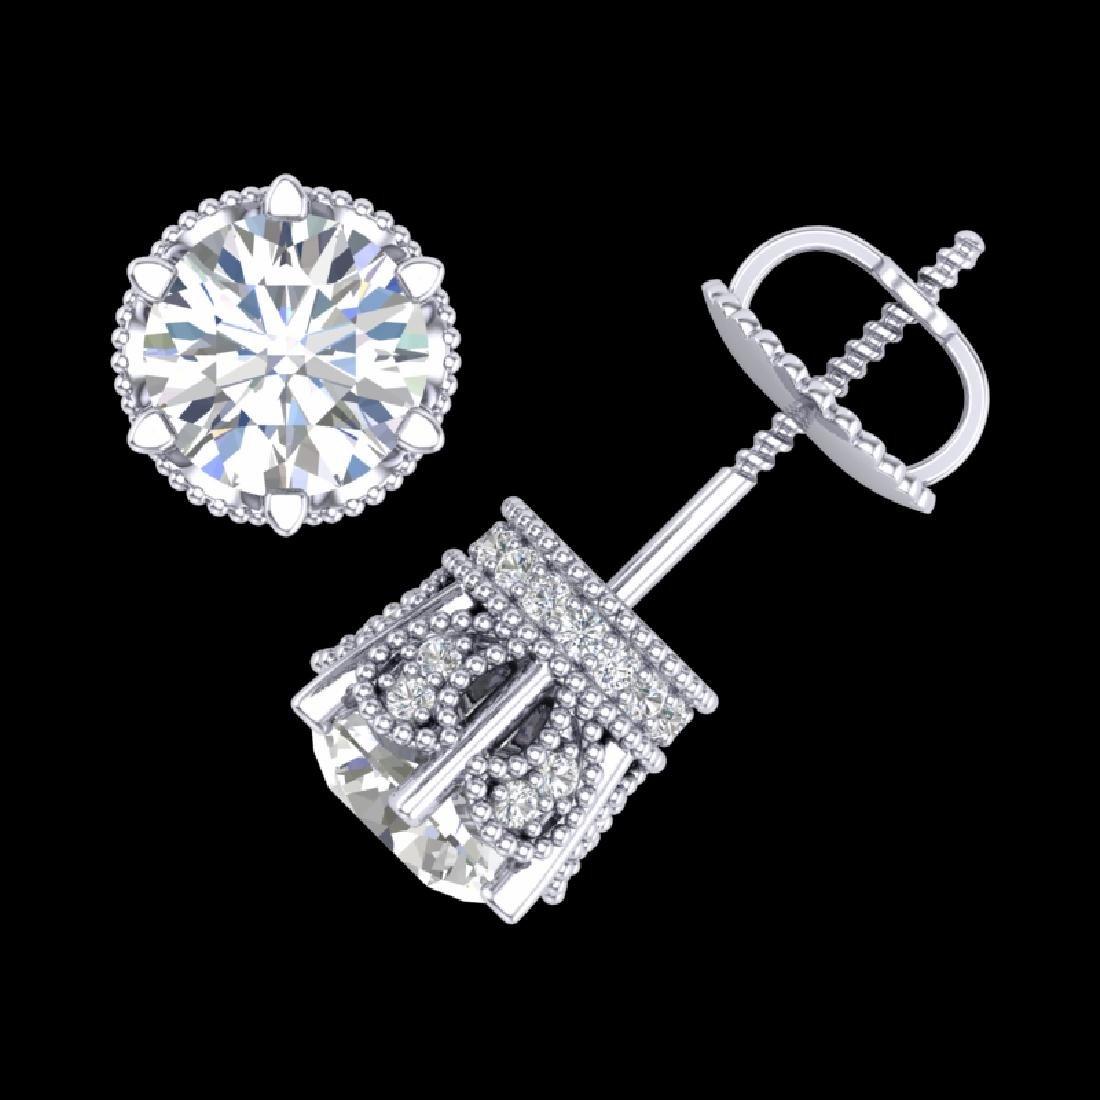 2.04 CTW VS/SI Diamond Solitaire Art Deco Stud Earrings - 3